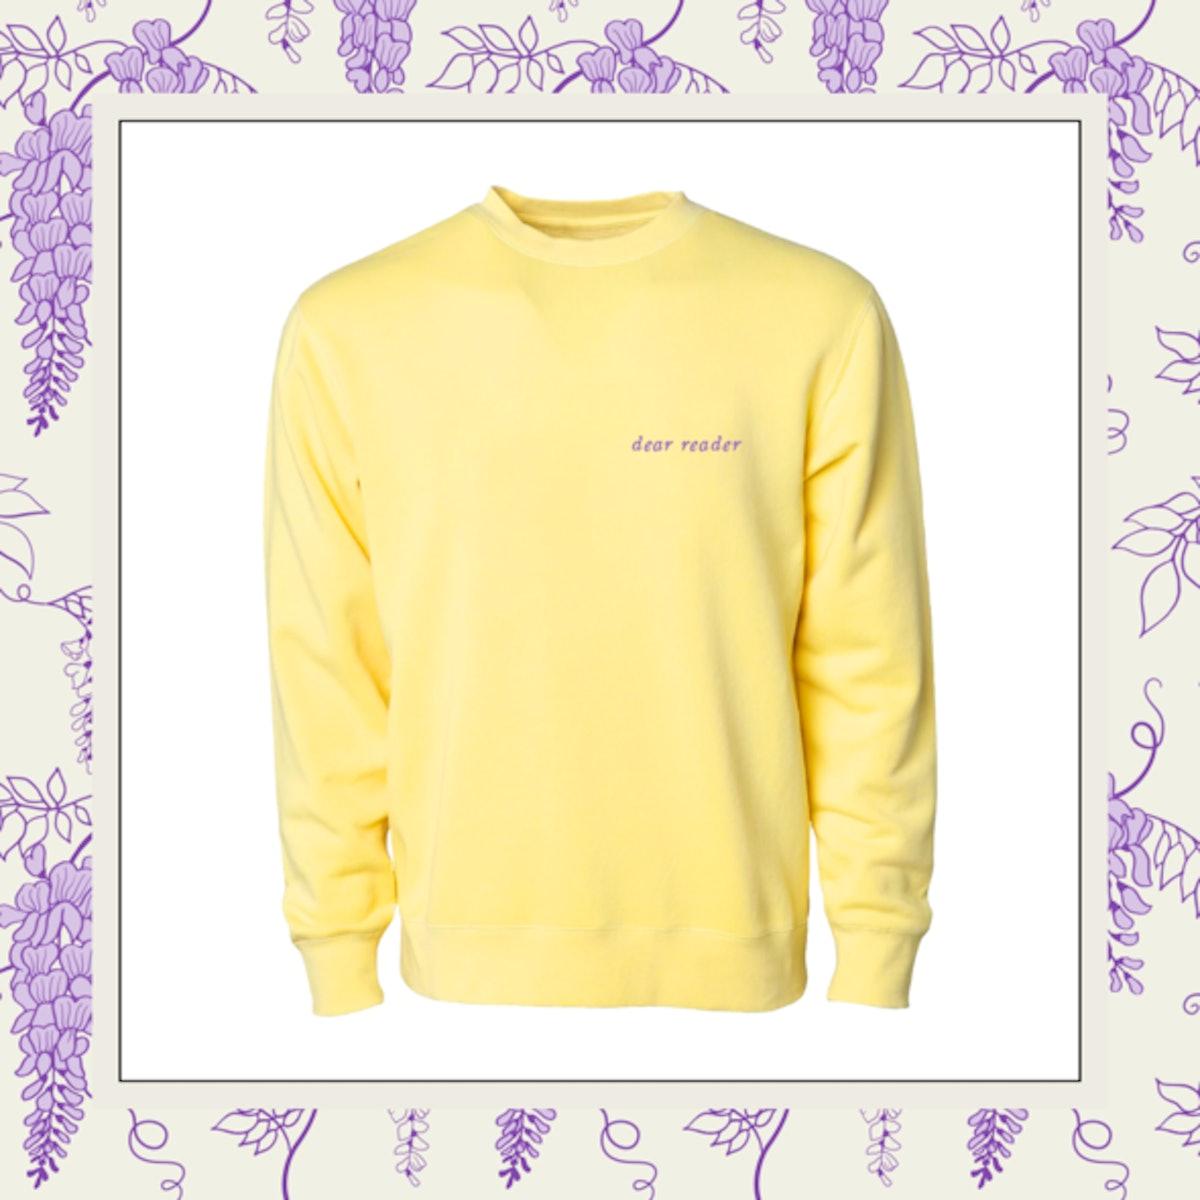 "Phenomenal x ""Bridgerton"" Collab (Dear Reader) Crewneck Sweatshirt"